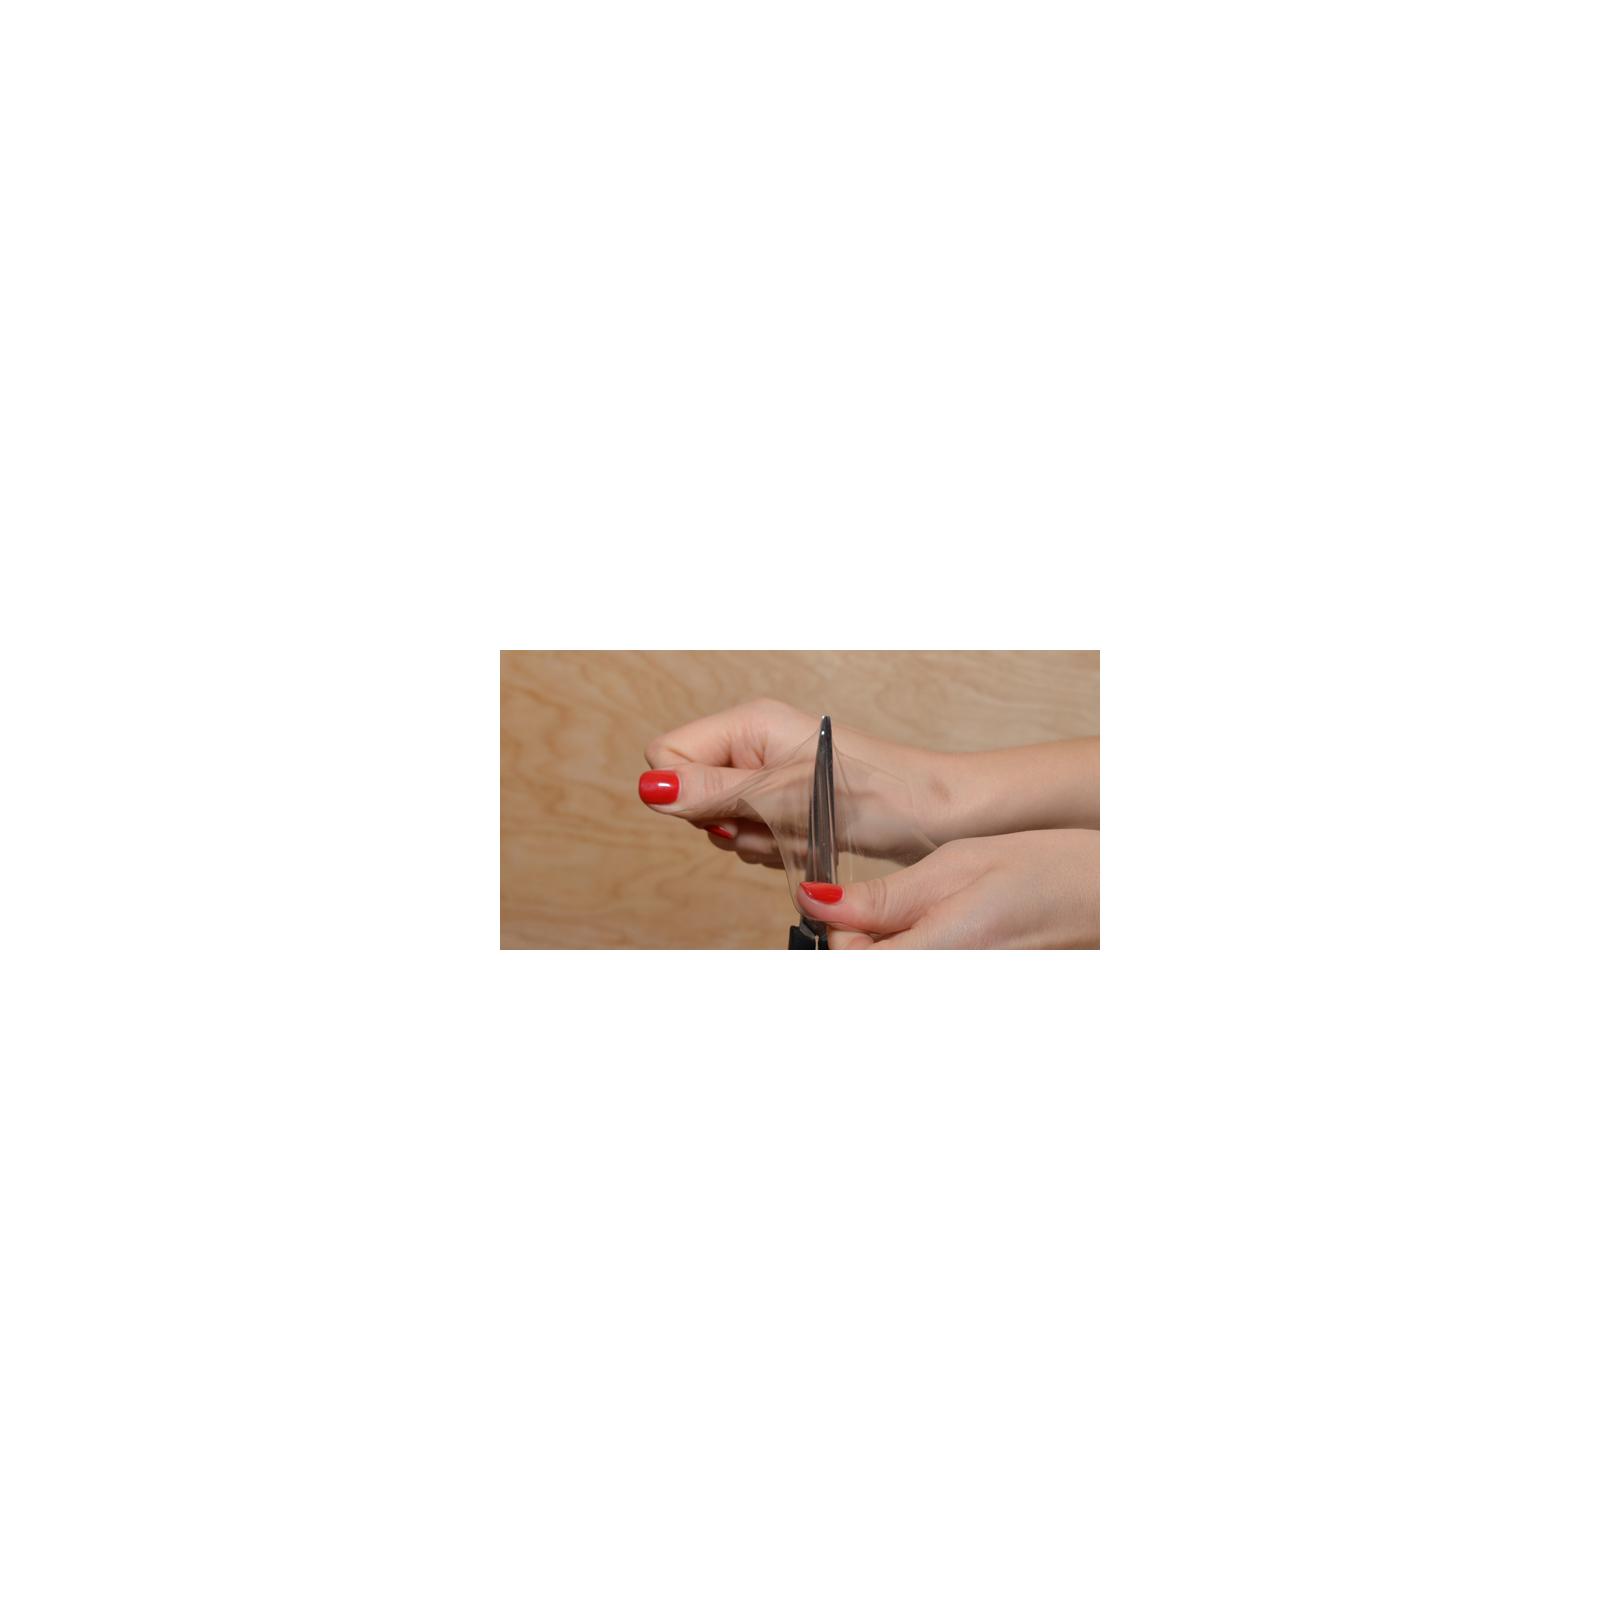 Пленка защитная JINN ультрапрочная Magic Screen для HTC Desire 700 (HTC Desire 700 front+back) изображение 4